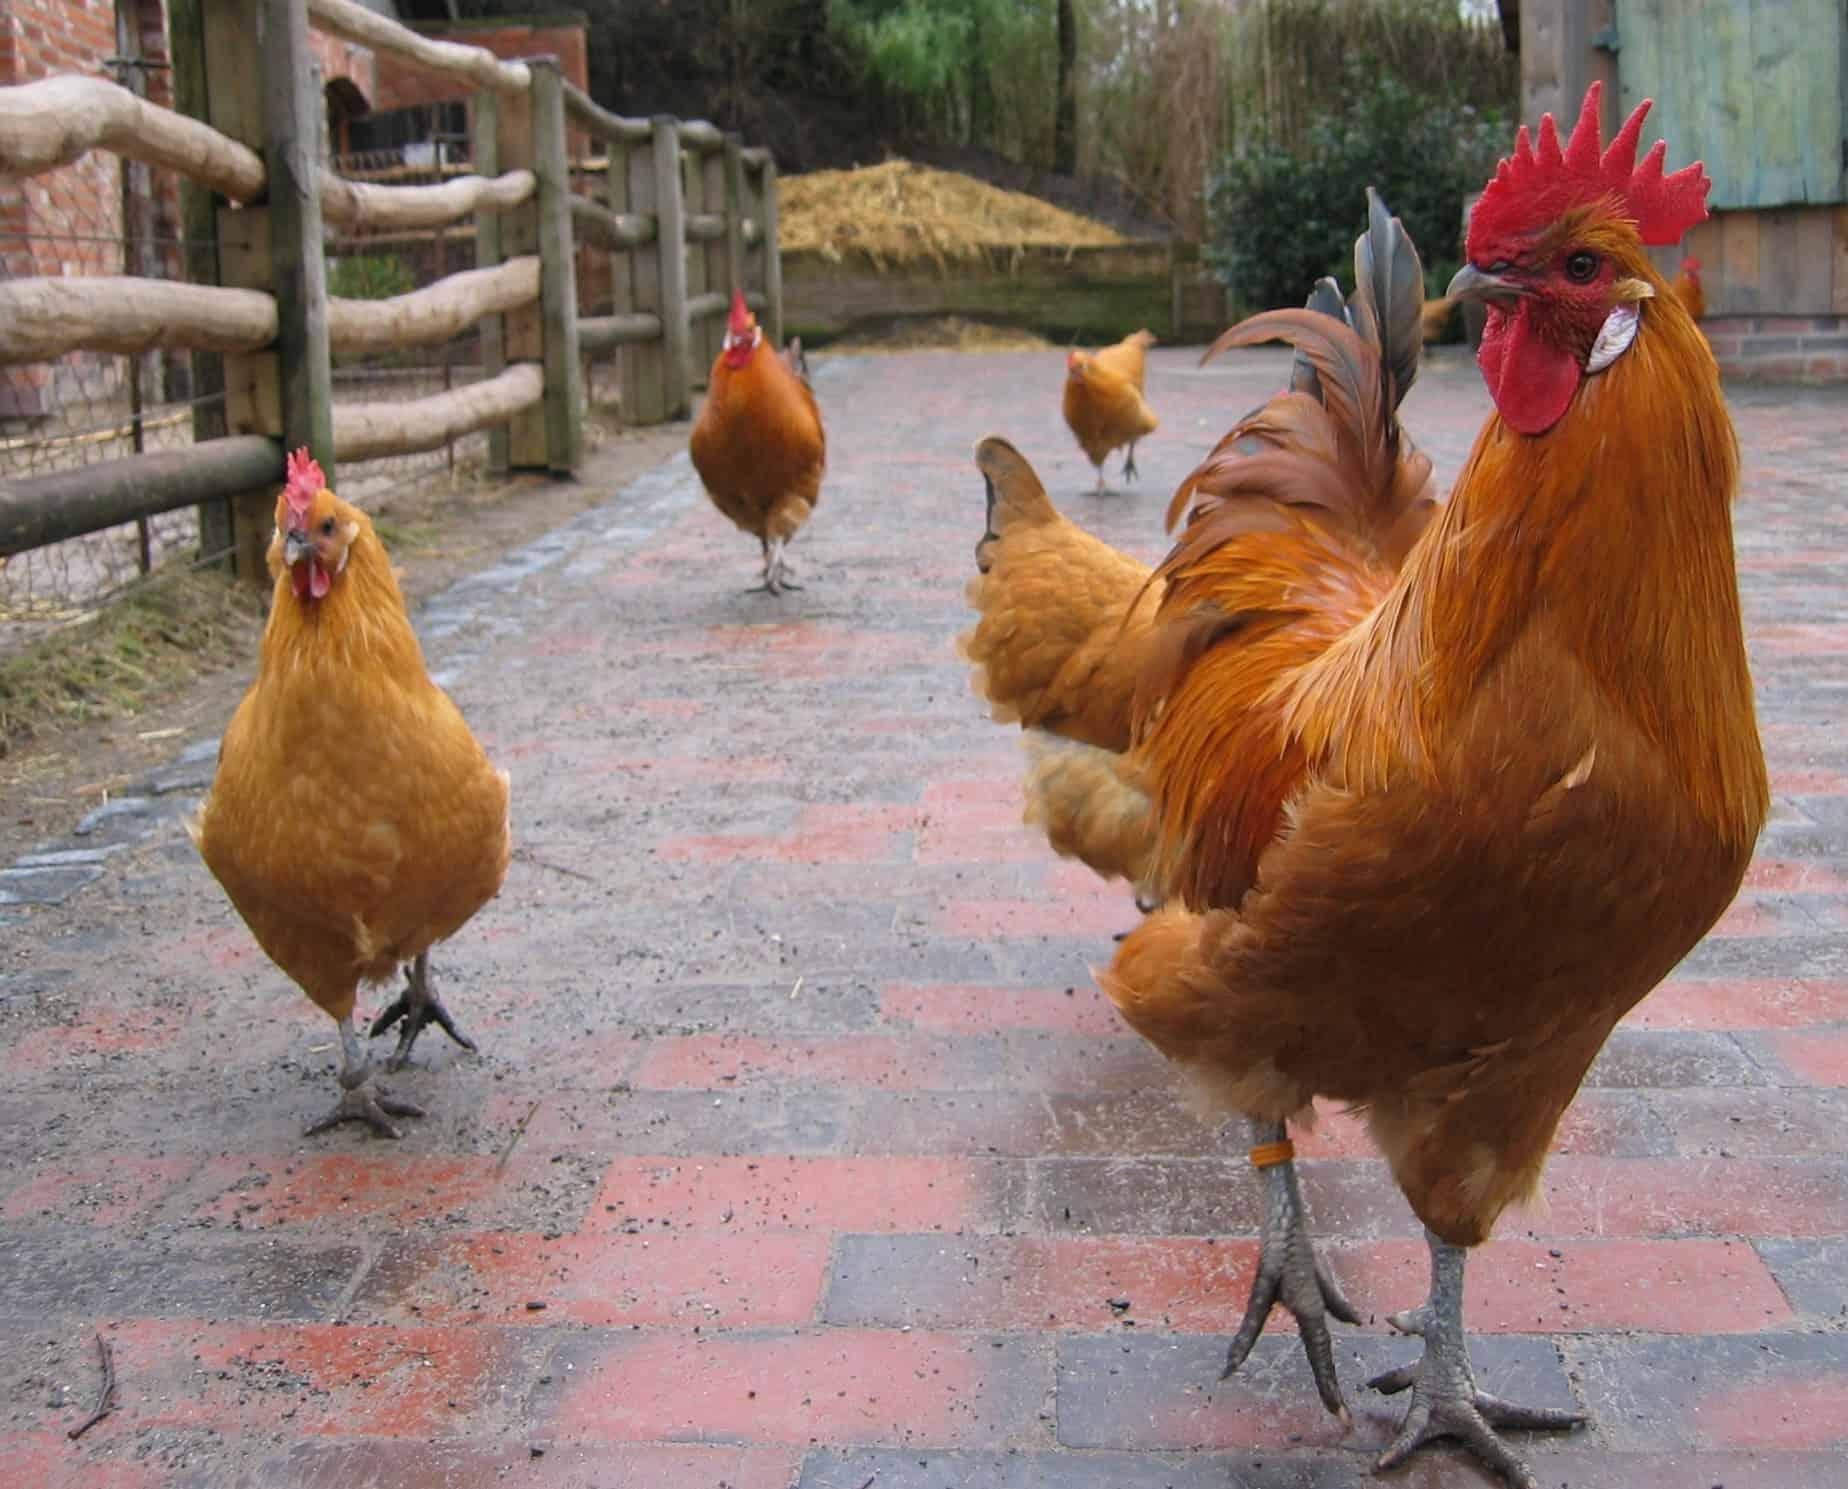 chickens-summer-6